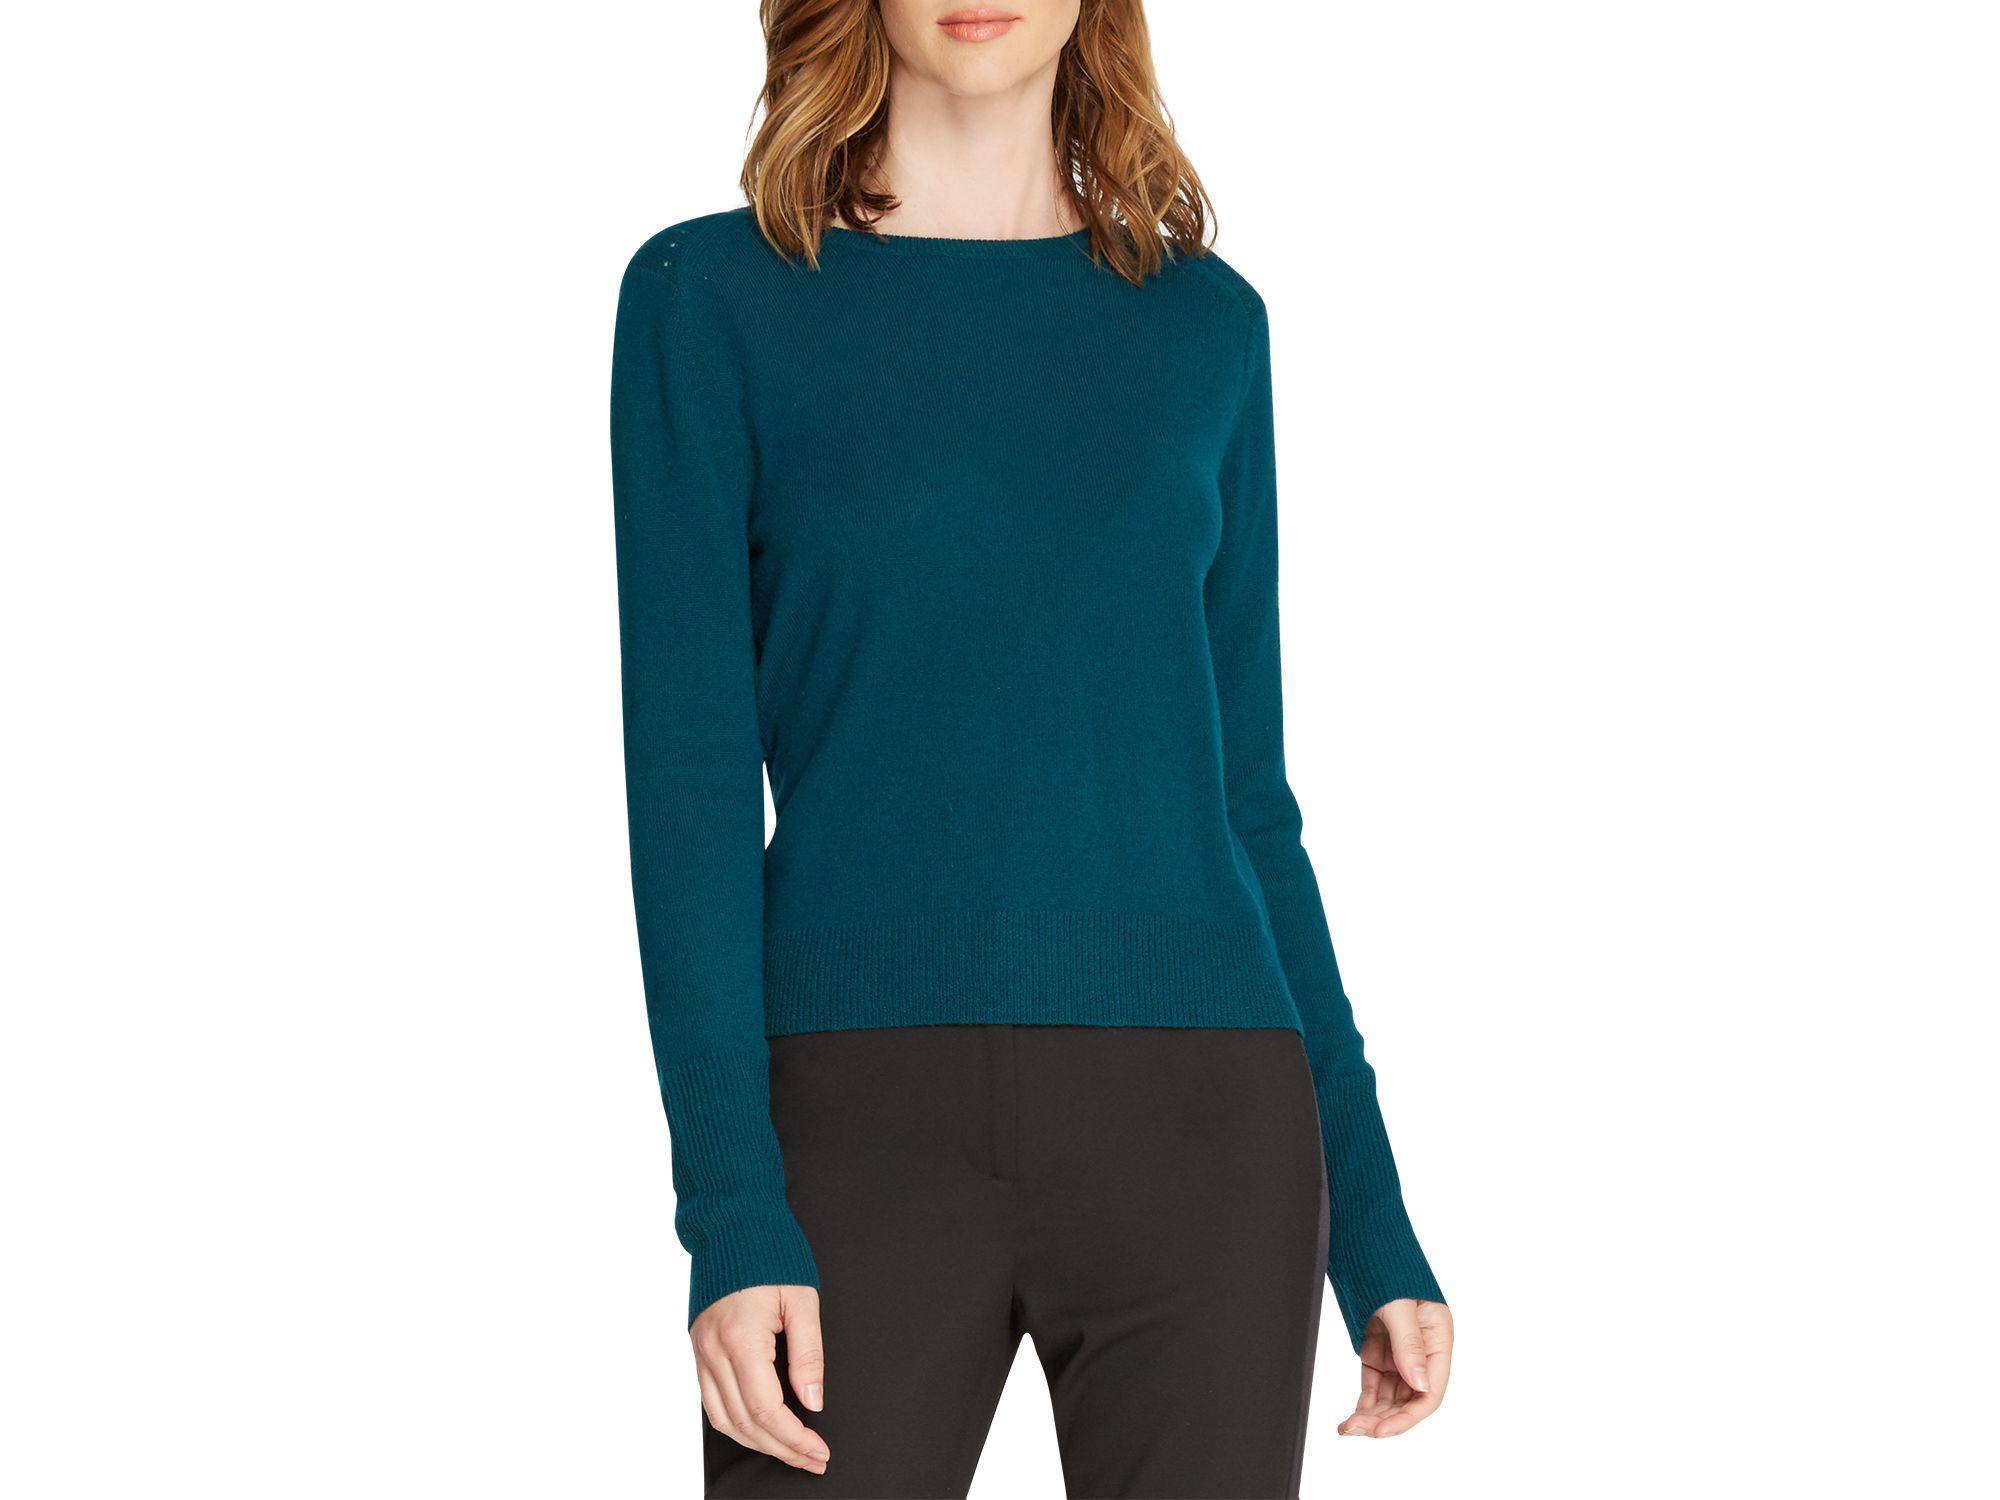 36fc12515e1 Lyst - Halston Cross Back Cashmere Sweater in Blue